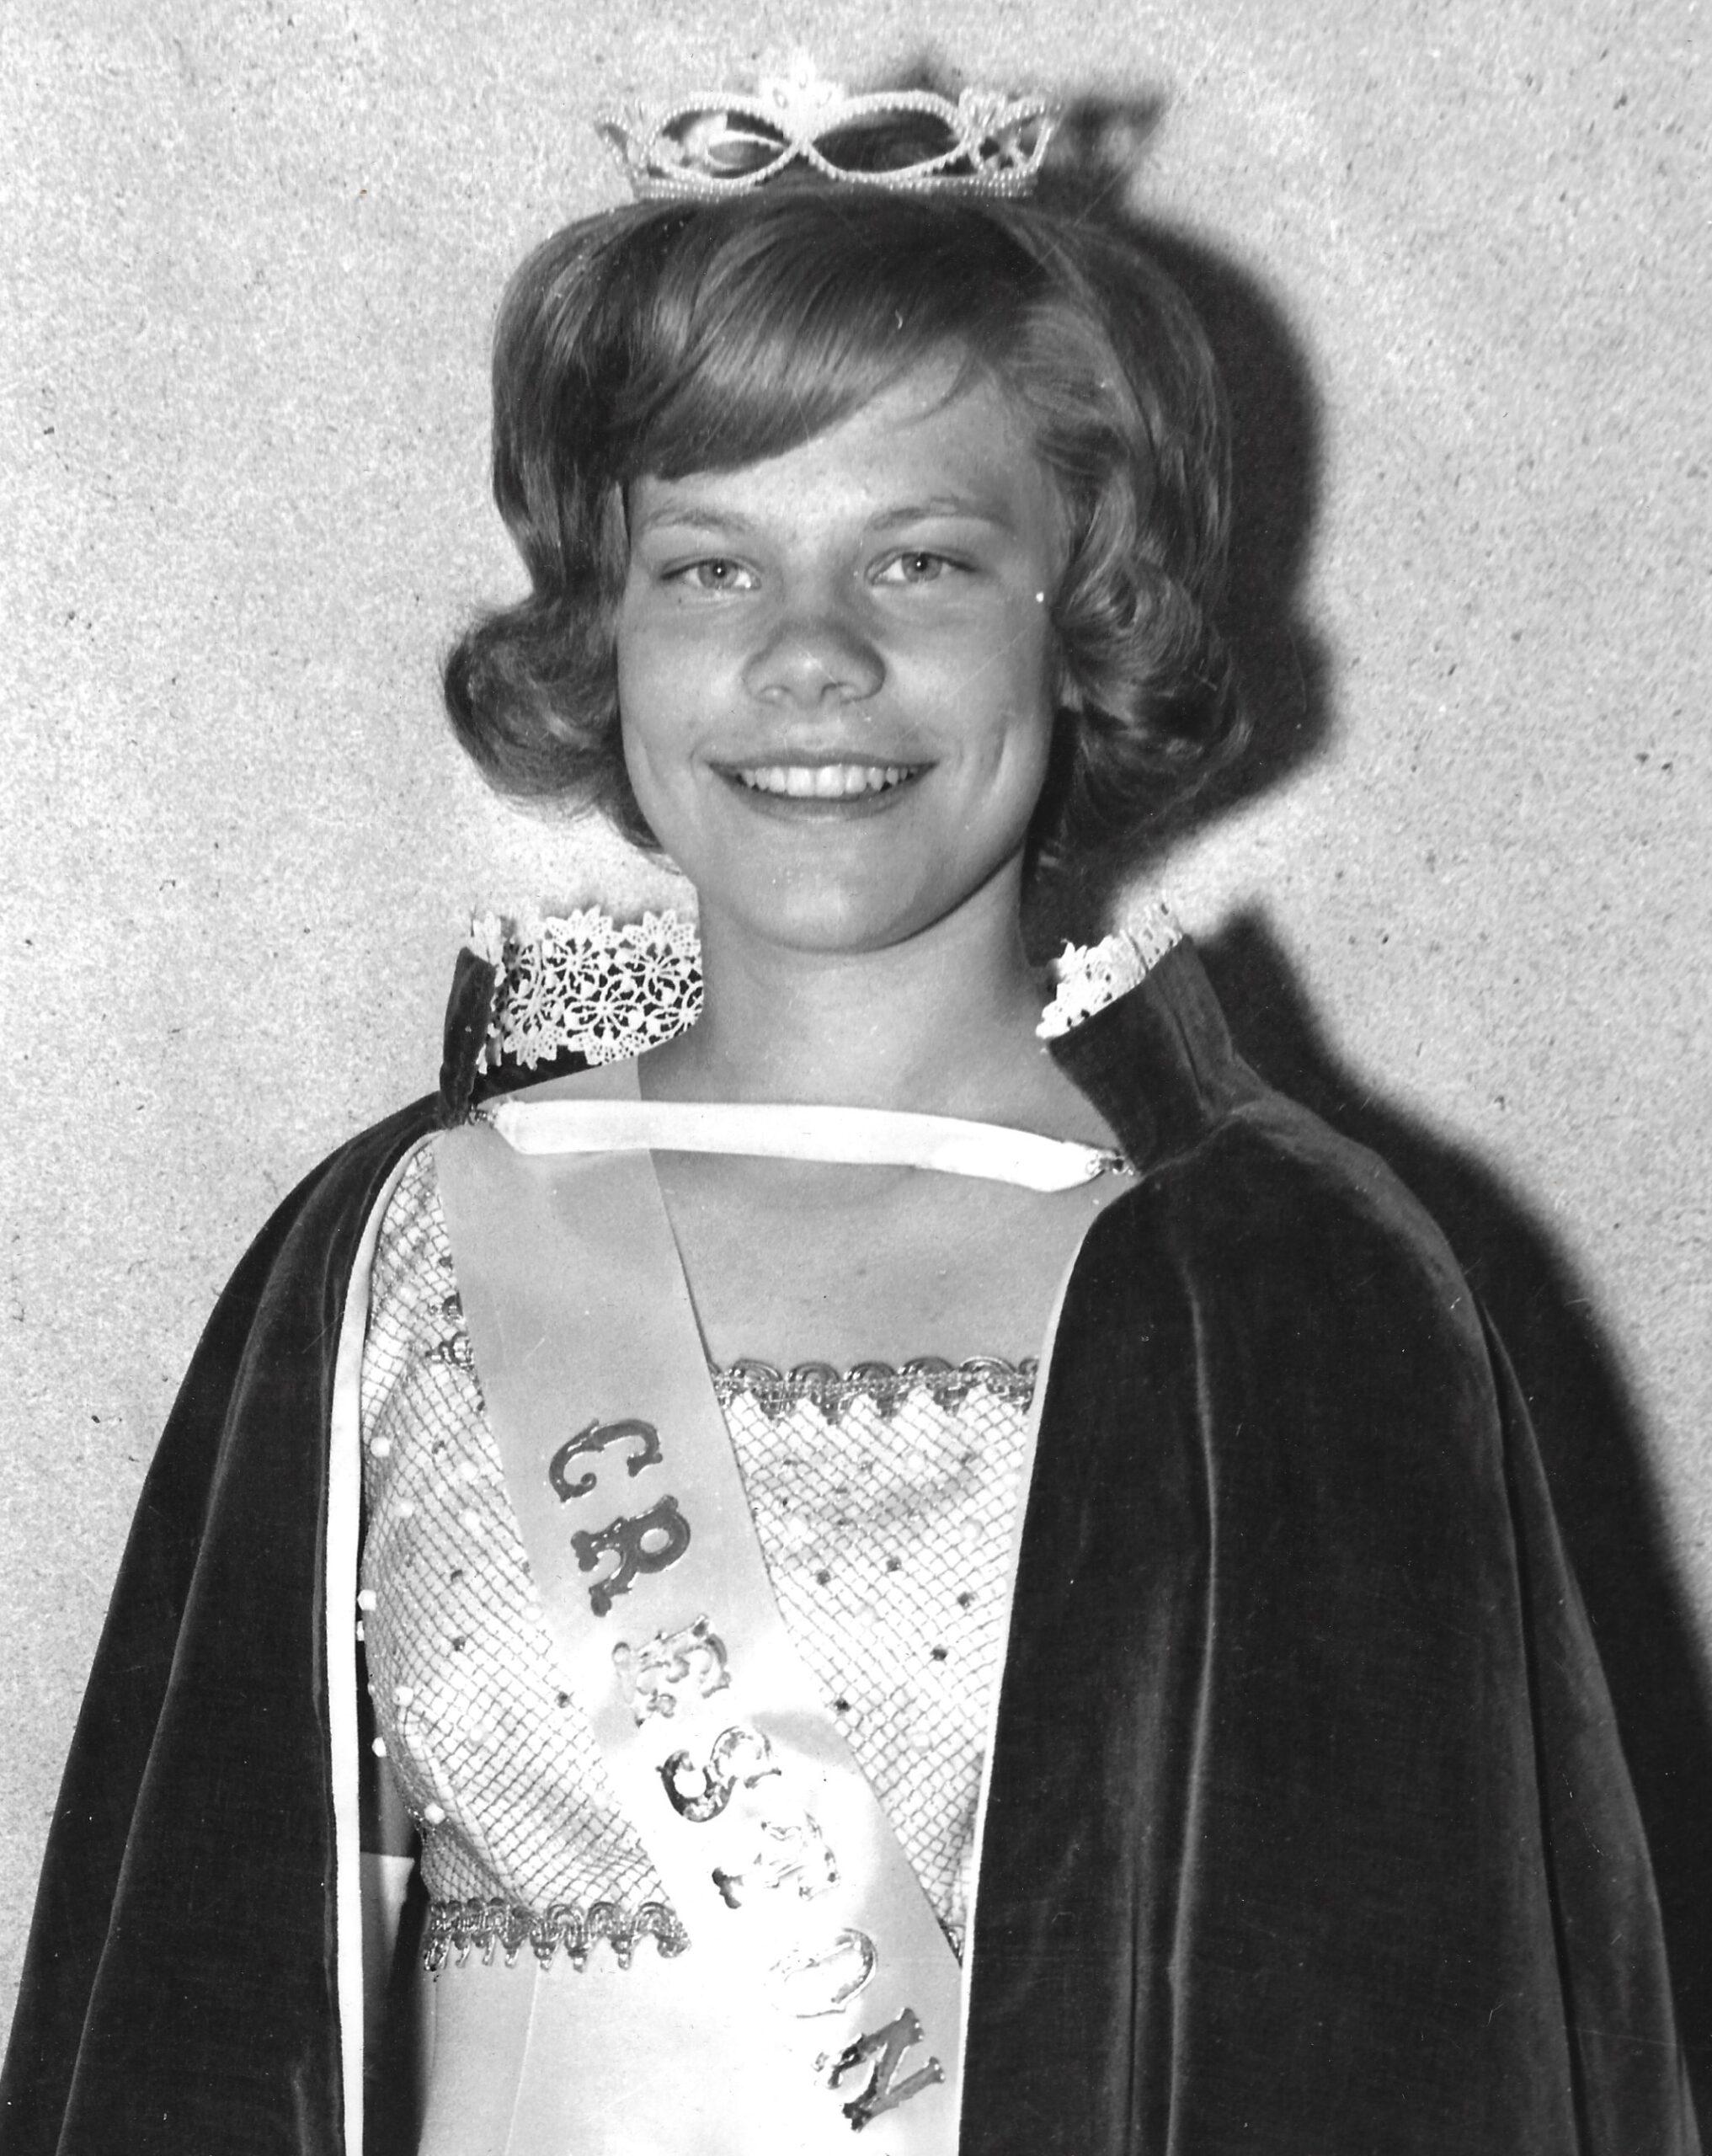 1966 Lincoln County Fair Queen